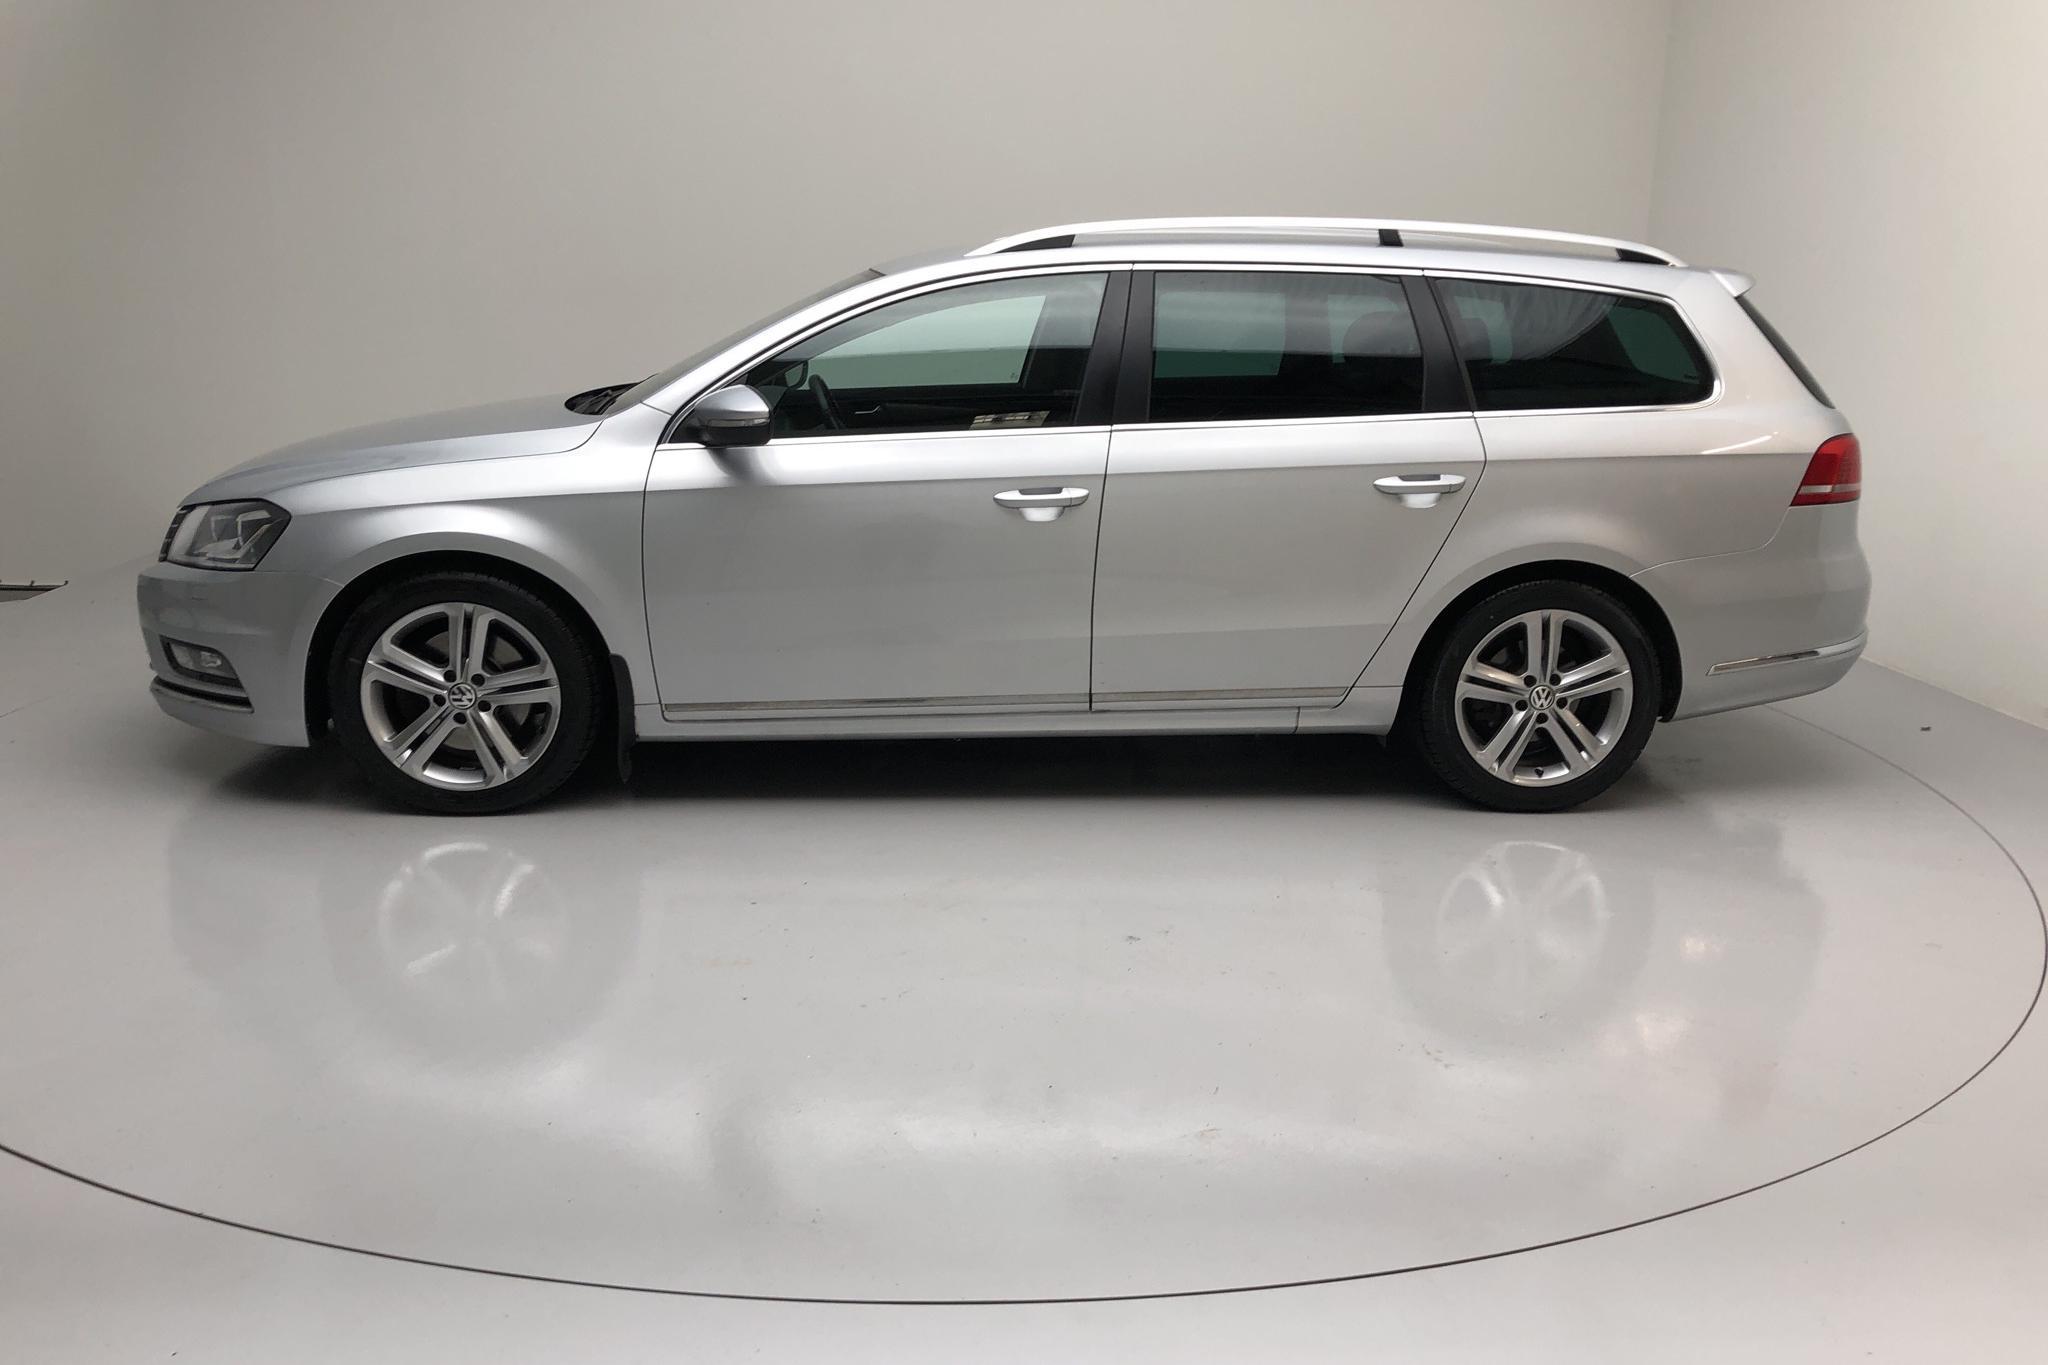 VW Passat 2.0 TDI BlueMotion Technology Variant 4Motion (177hk) - 117 000 km - Automatic - silver - 2014